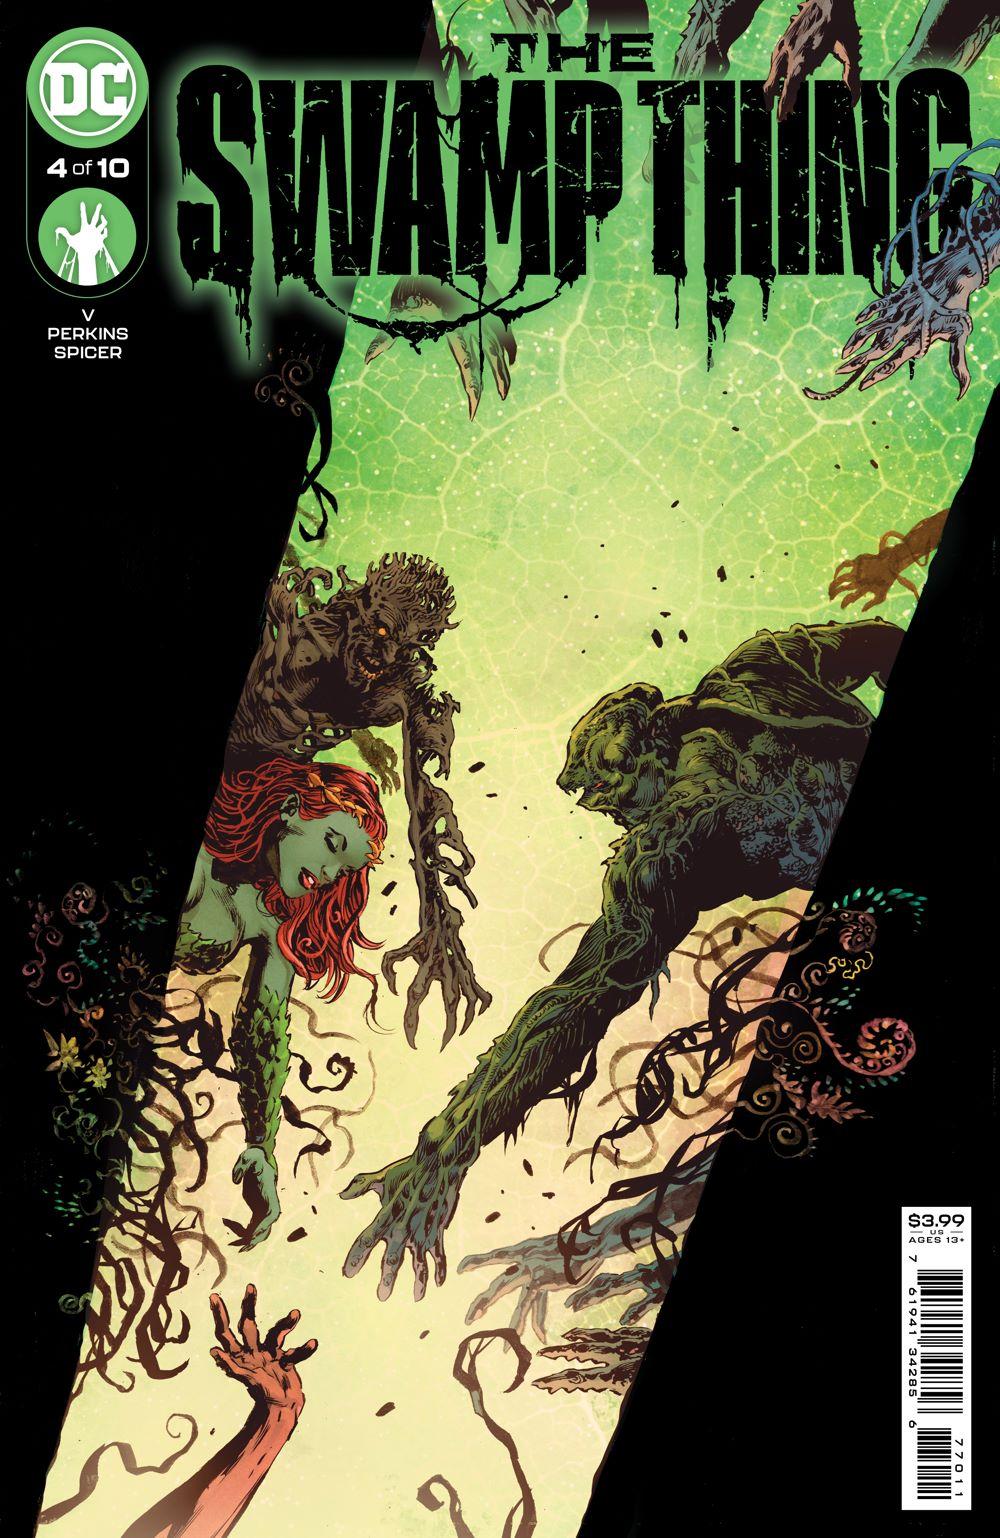 THESWAMPTHING_Cv4 DC Comics June 2021 Solicitations